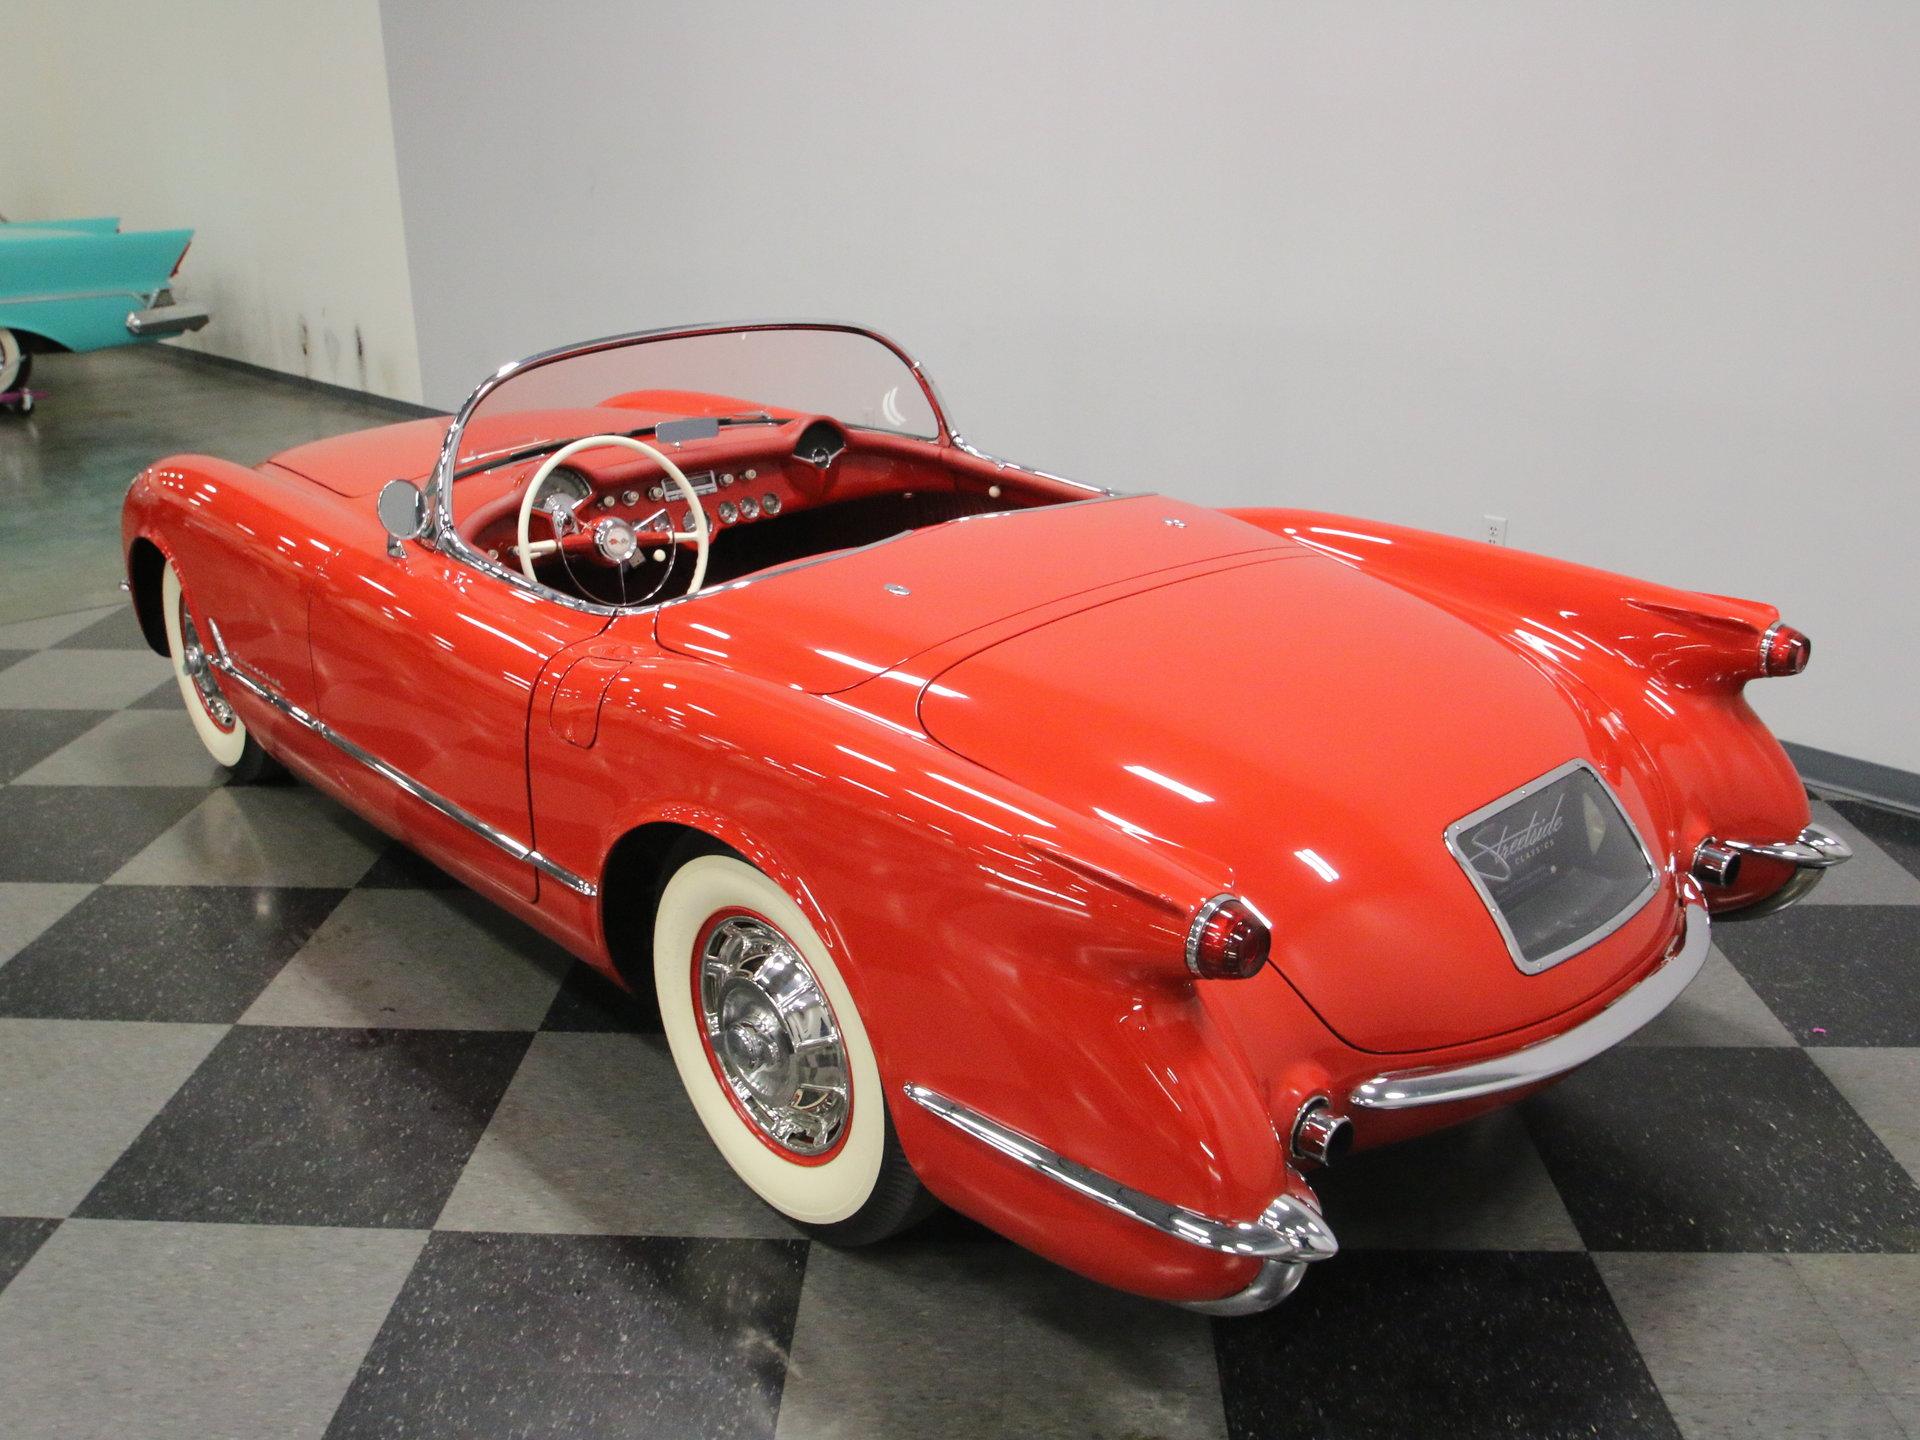 1954 chevrolet corvette for sale 76785 mcg 1954 Mercury Orange 1954 1954 chevrolet corvette for sale